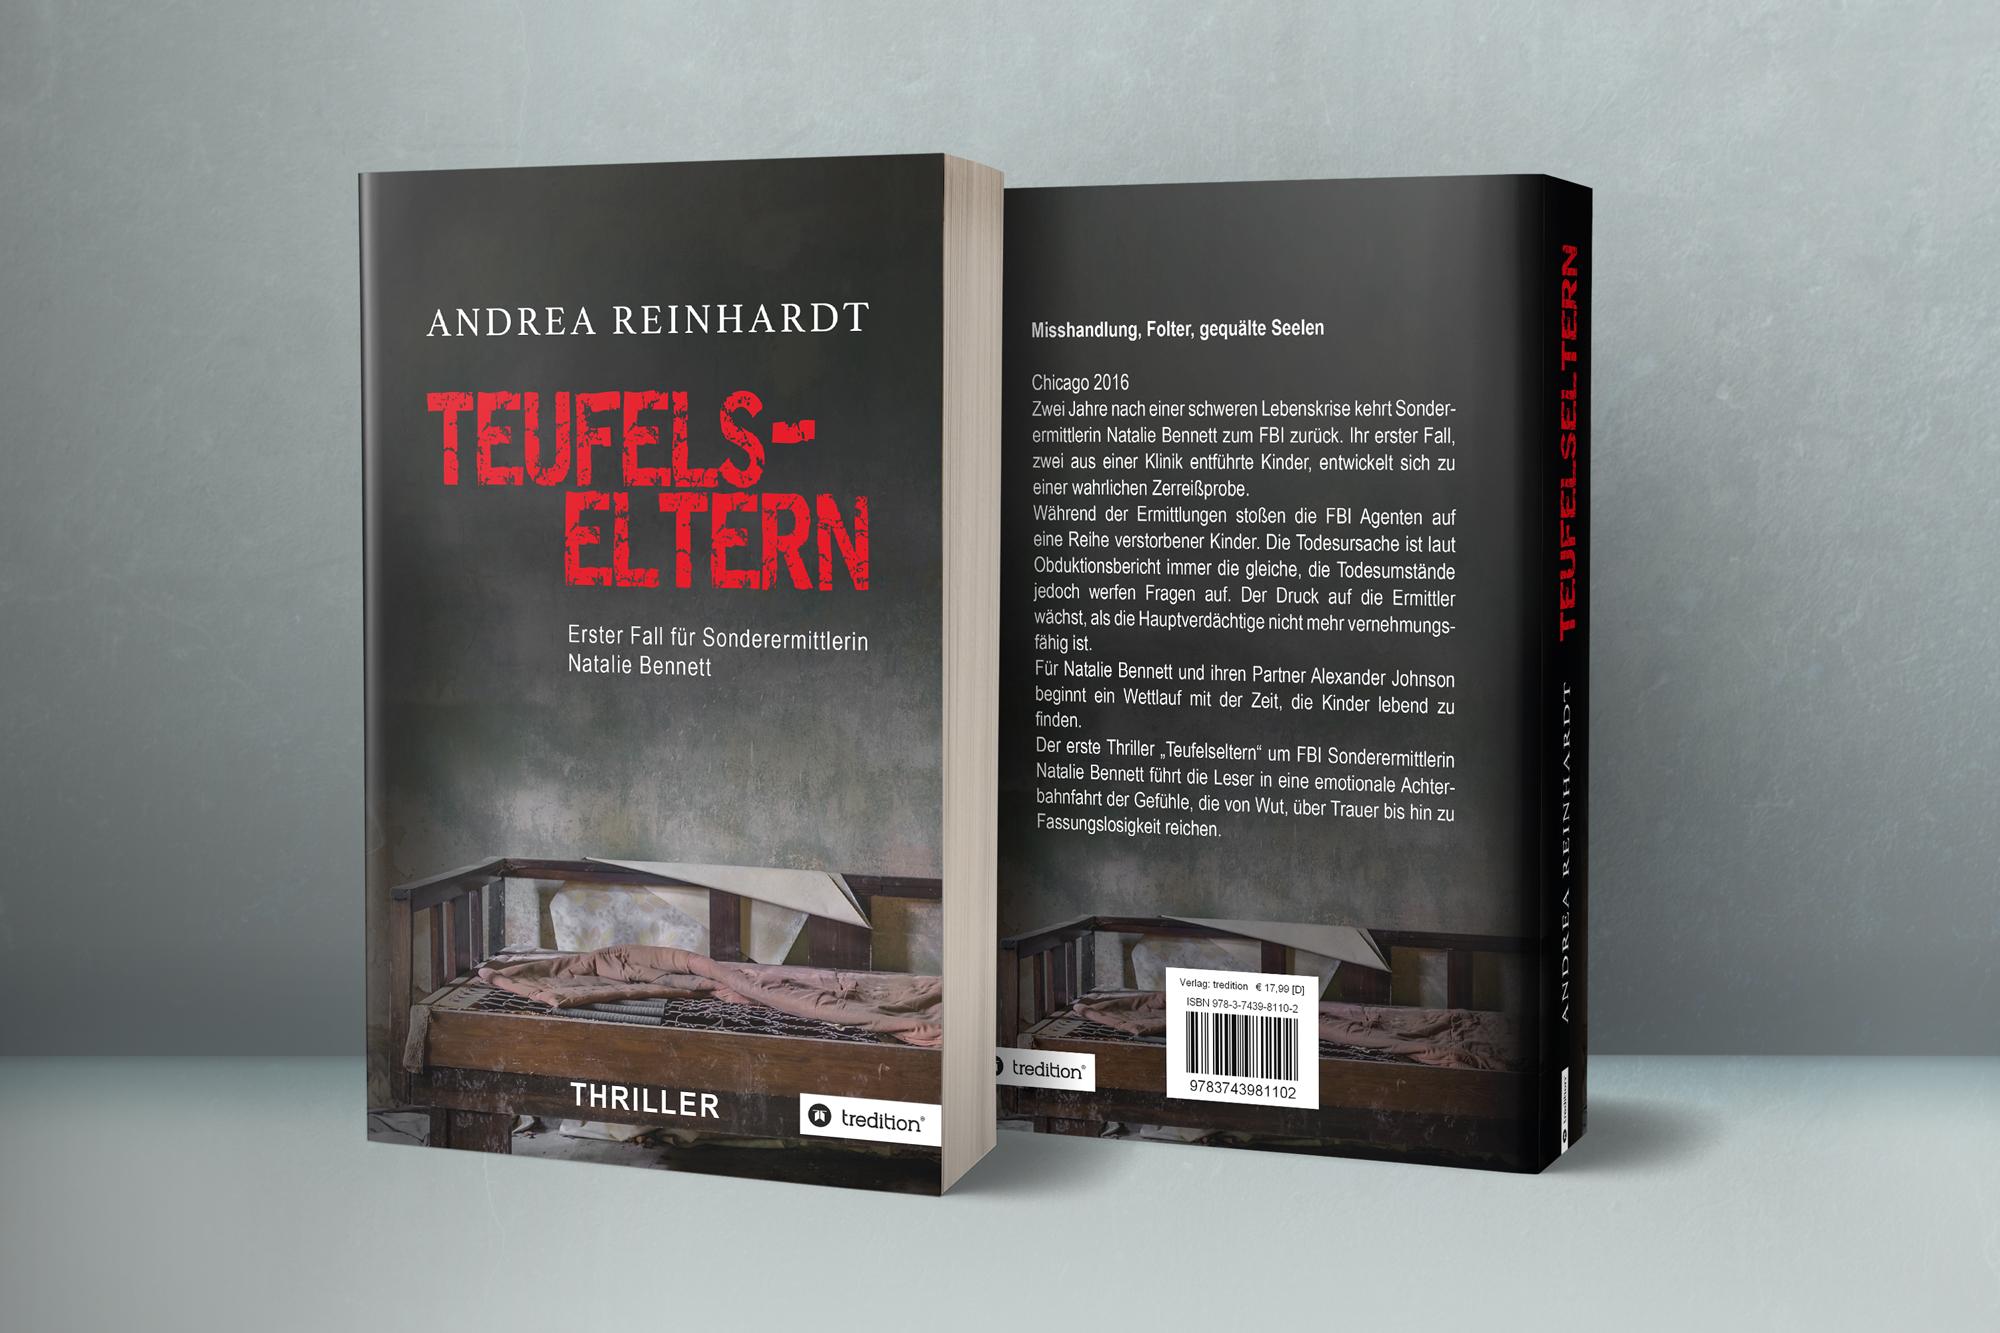 """Teufelseltern – Erster Fall für Sonderermittlerin Natalie Bennett"" – Andrea Reinhardt"